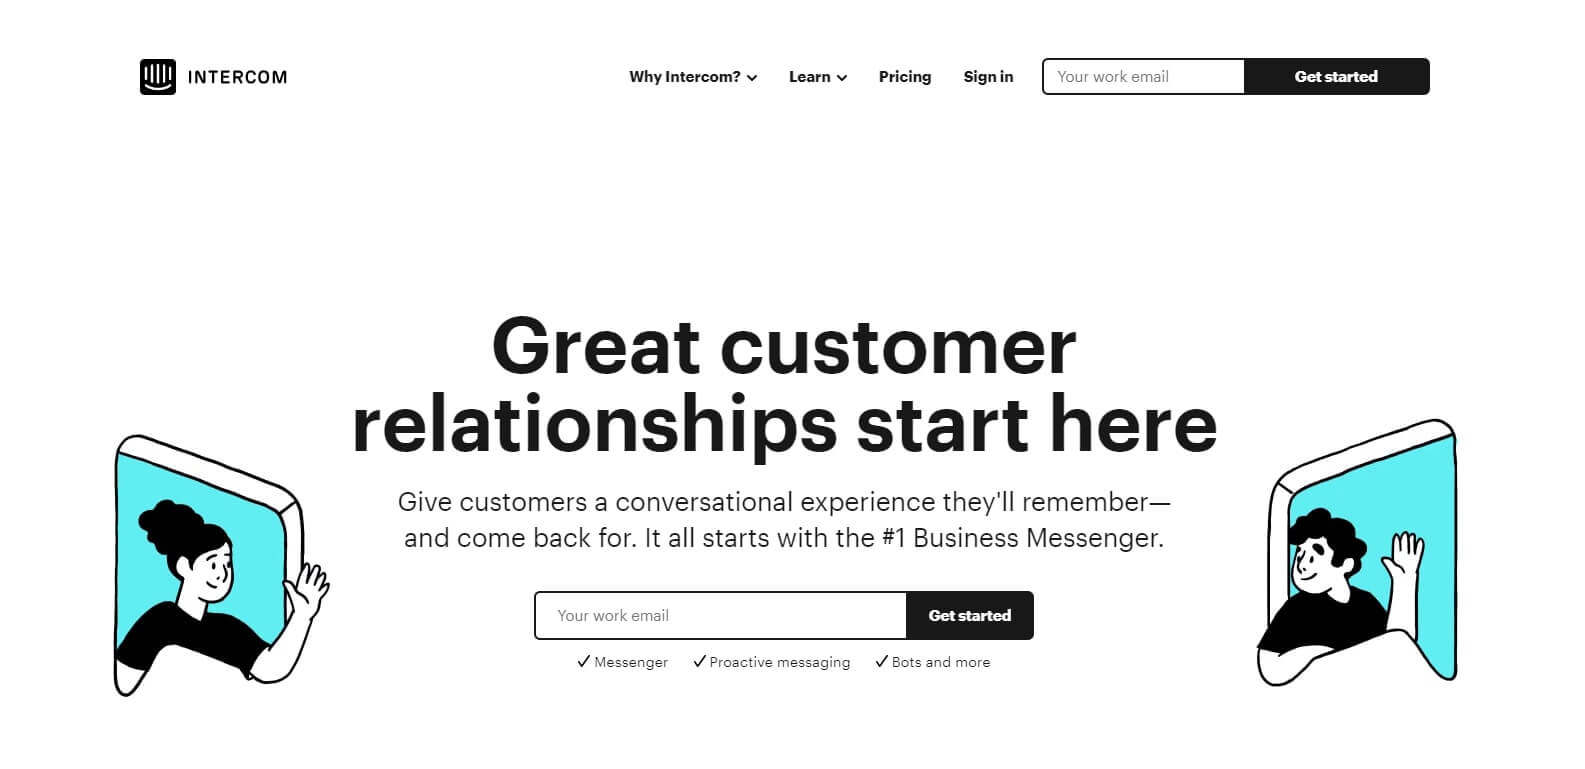 Intercom main landing page